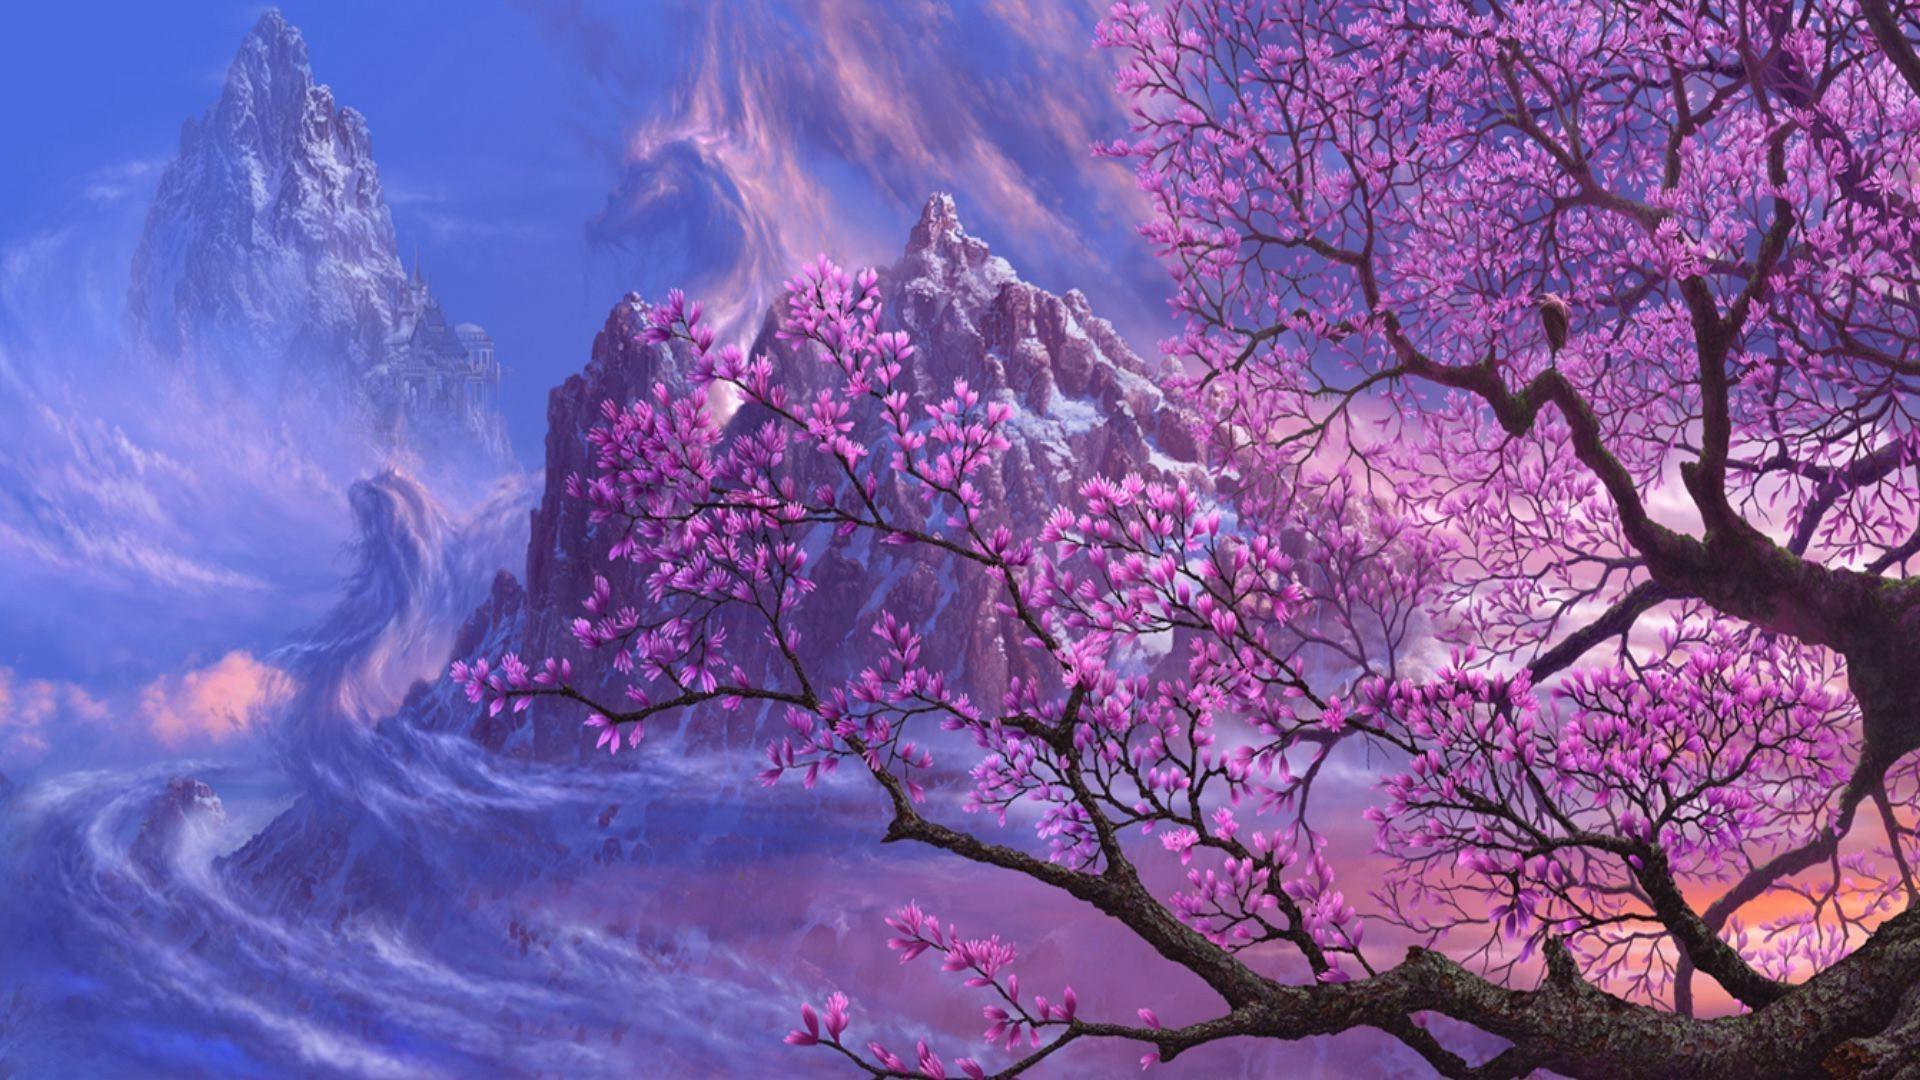 Magnolia wallpaper wallpapersafari - Magnolia background ...